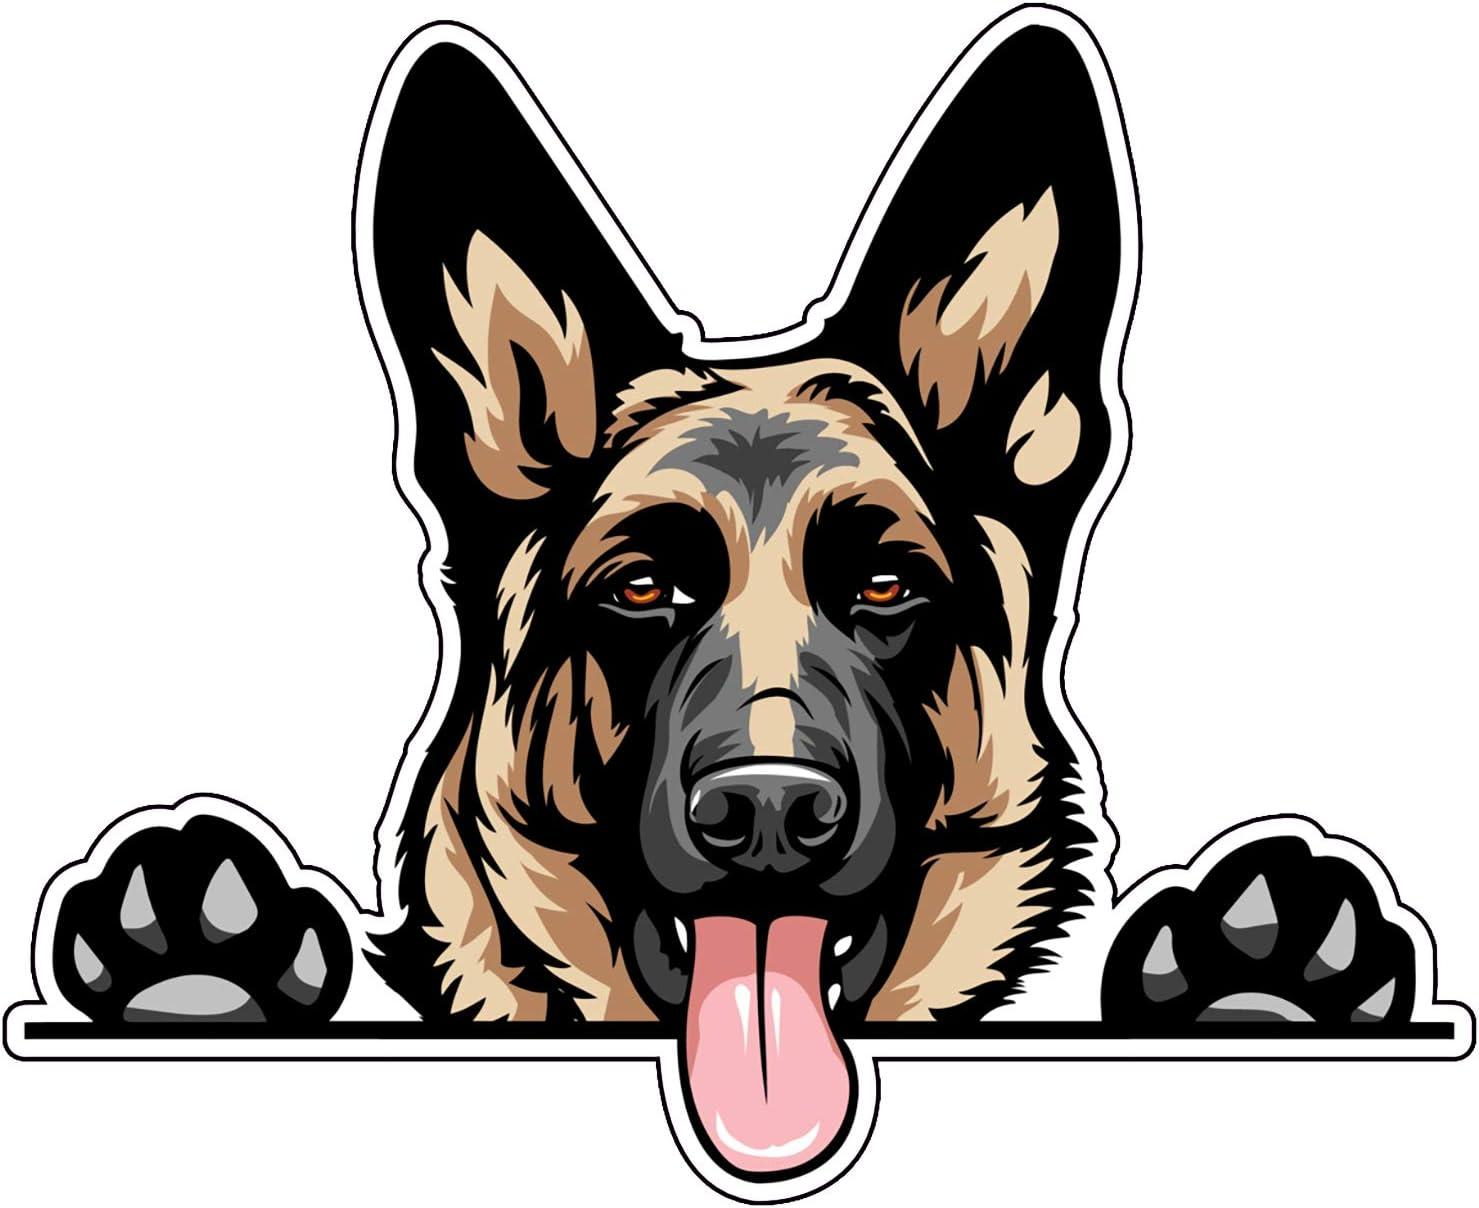 WickedGoodz German Shepherd Decal - Smiling Dog Breed Bumper Sticker - for Laptops Tumblers Windows Cars Trucks Walls - Full Color